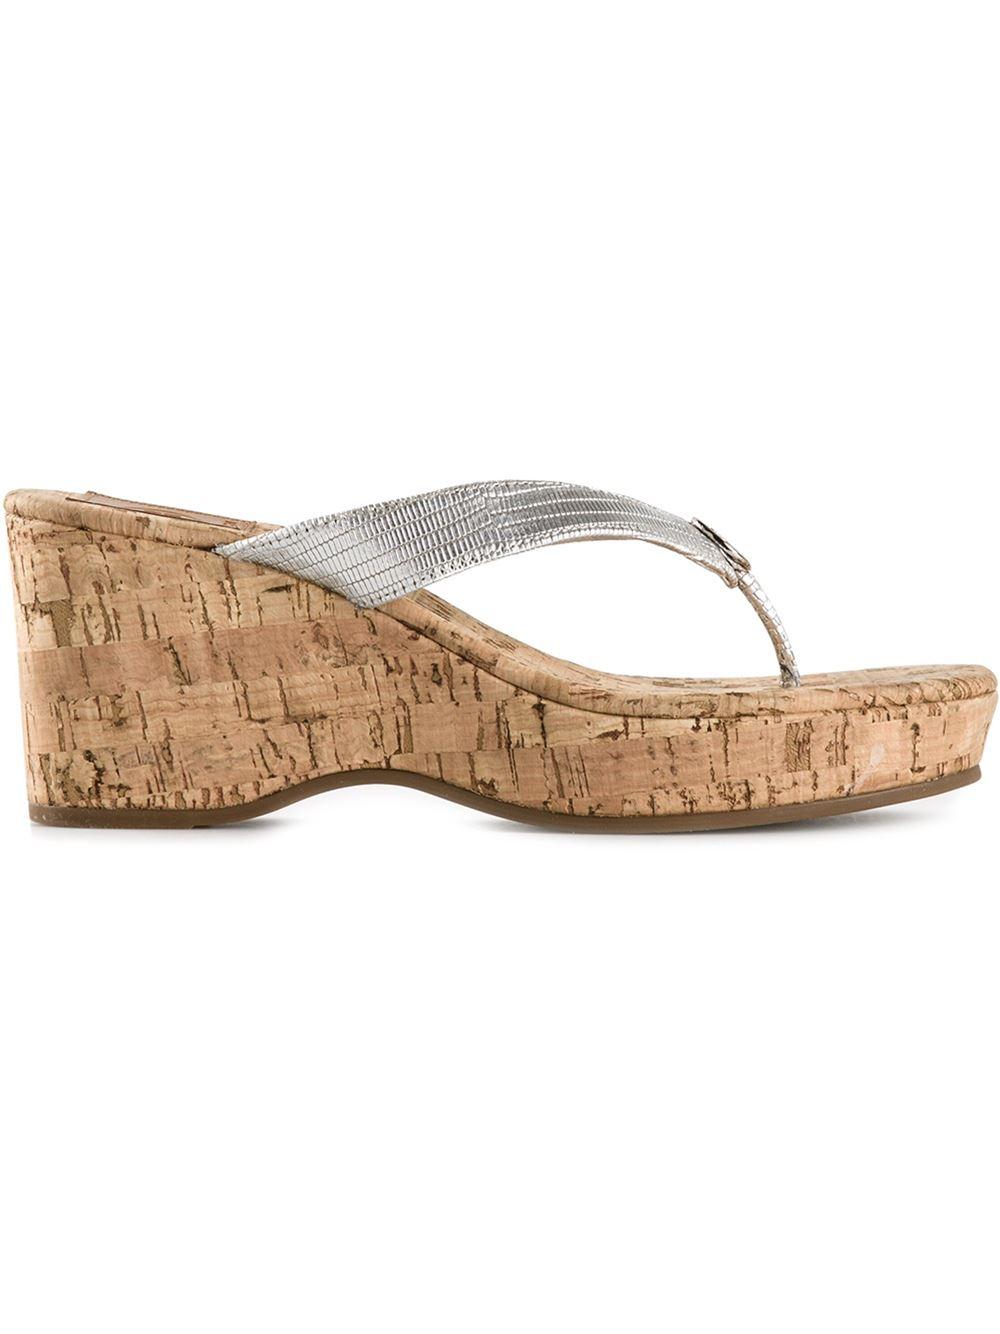 Lyst Tory Burch Cork Wedge Sandals In Metallic